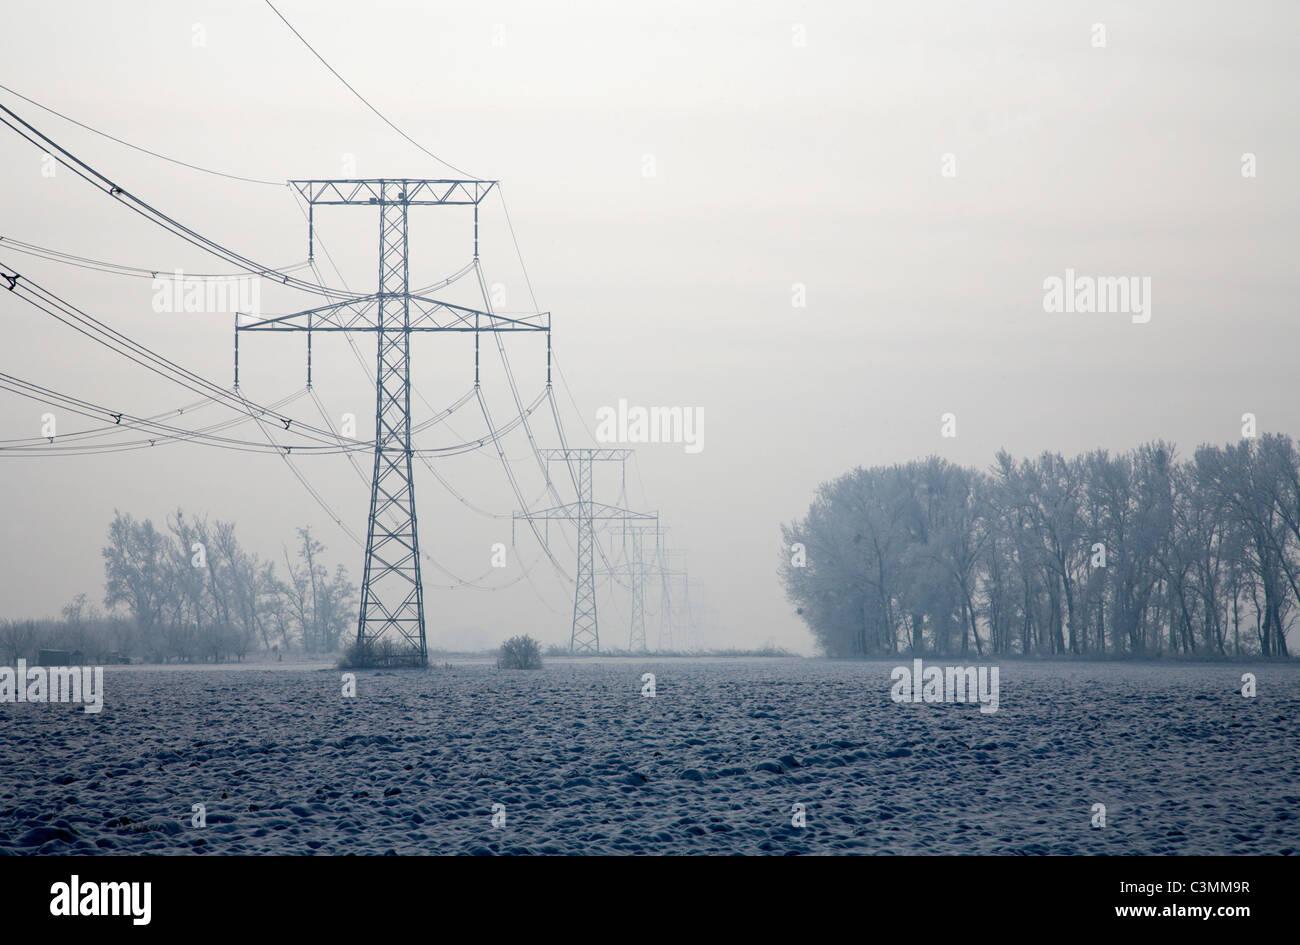 mast in winter landscape - west Slovakia - Stock Image